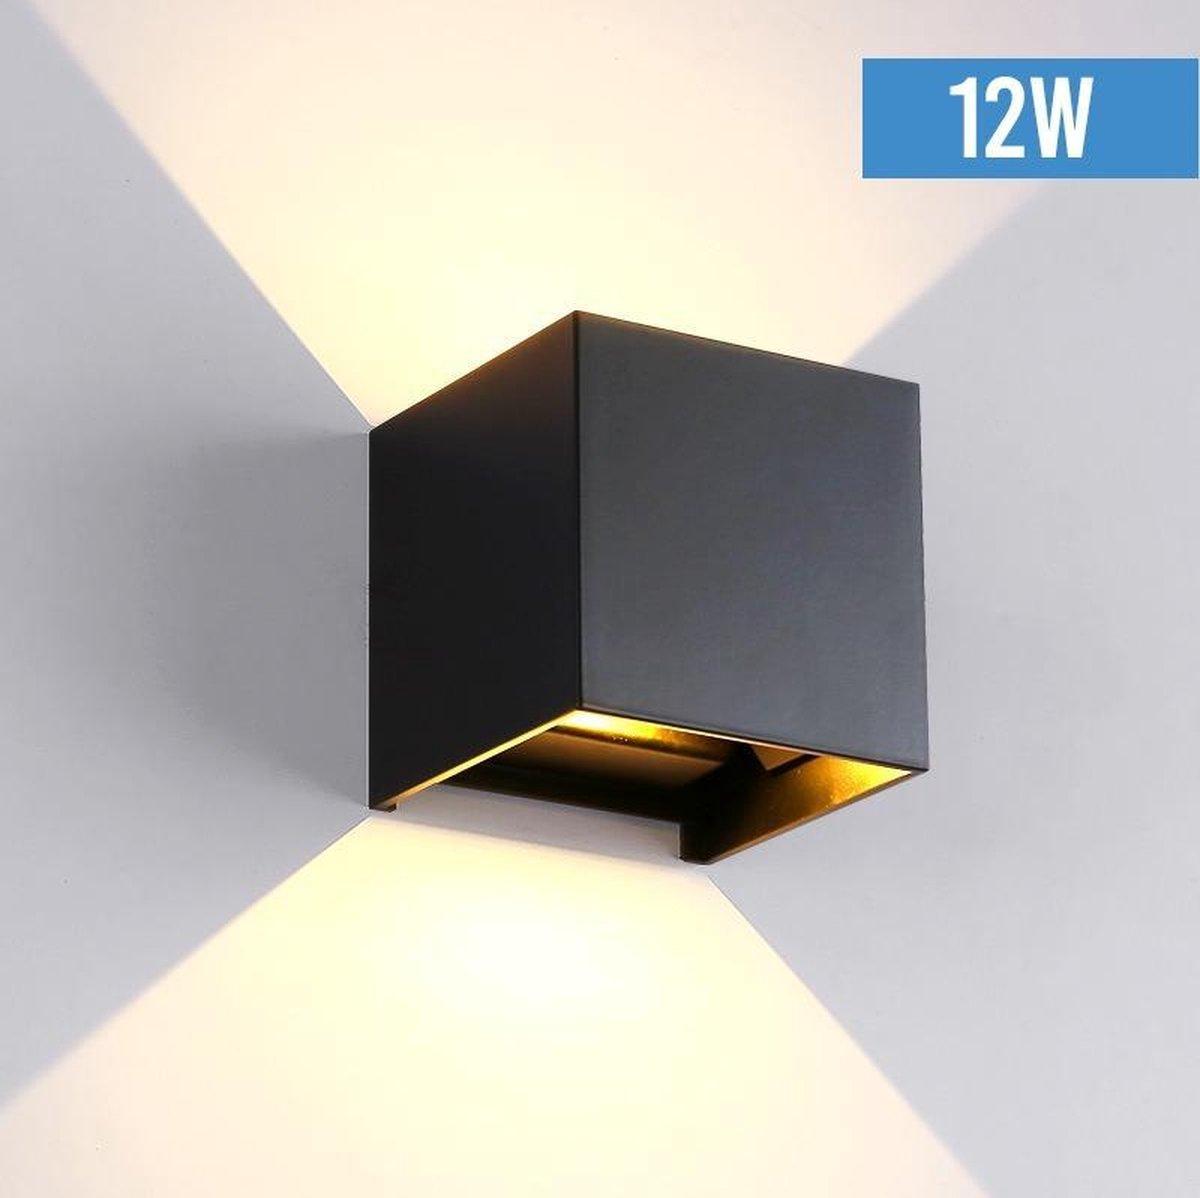 BIZZ Light   LED-wandlamp - voor binnen en buiten - warm wit